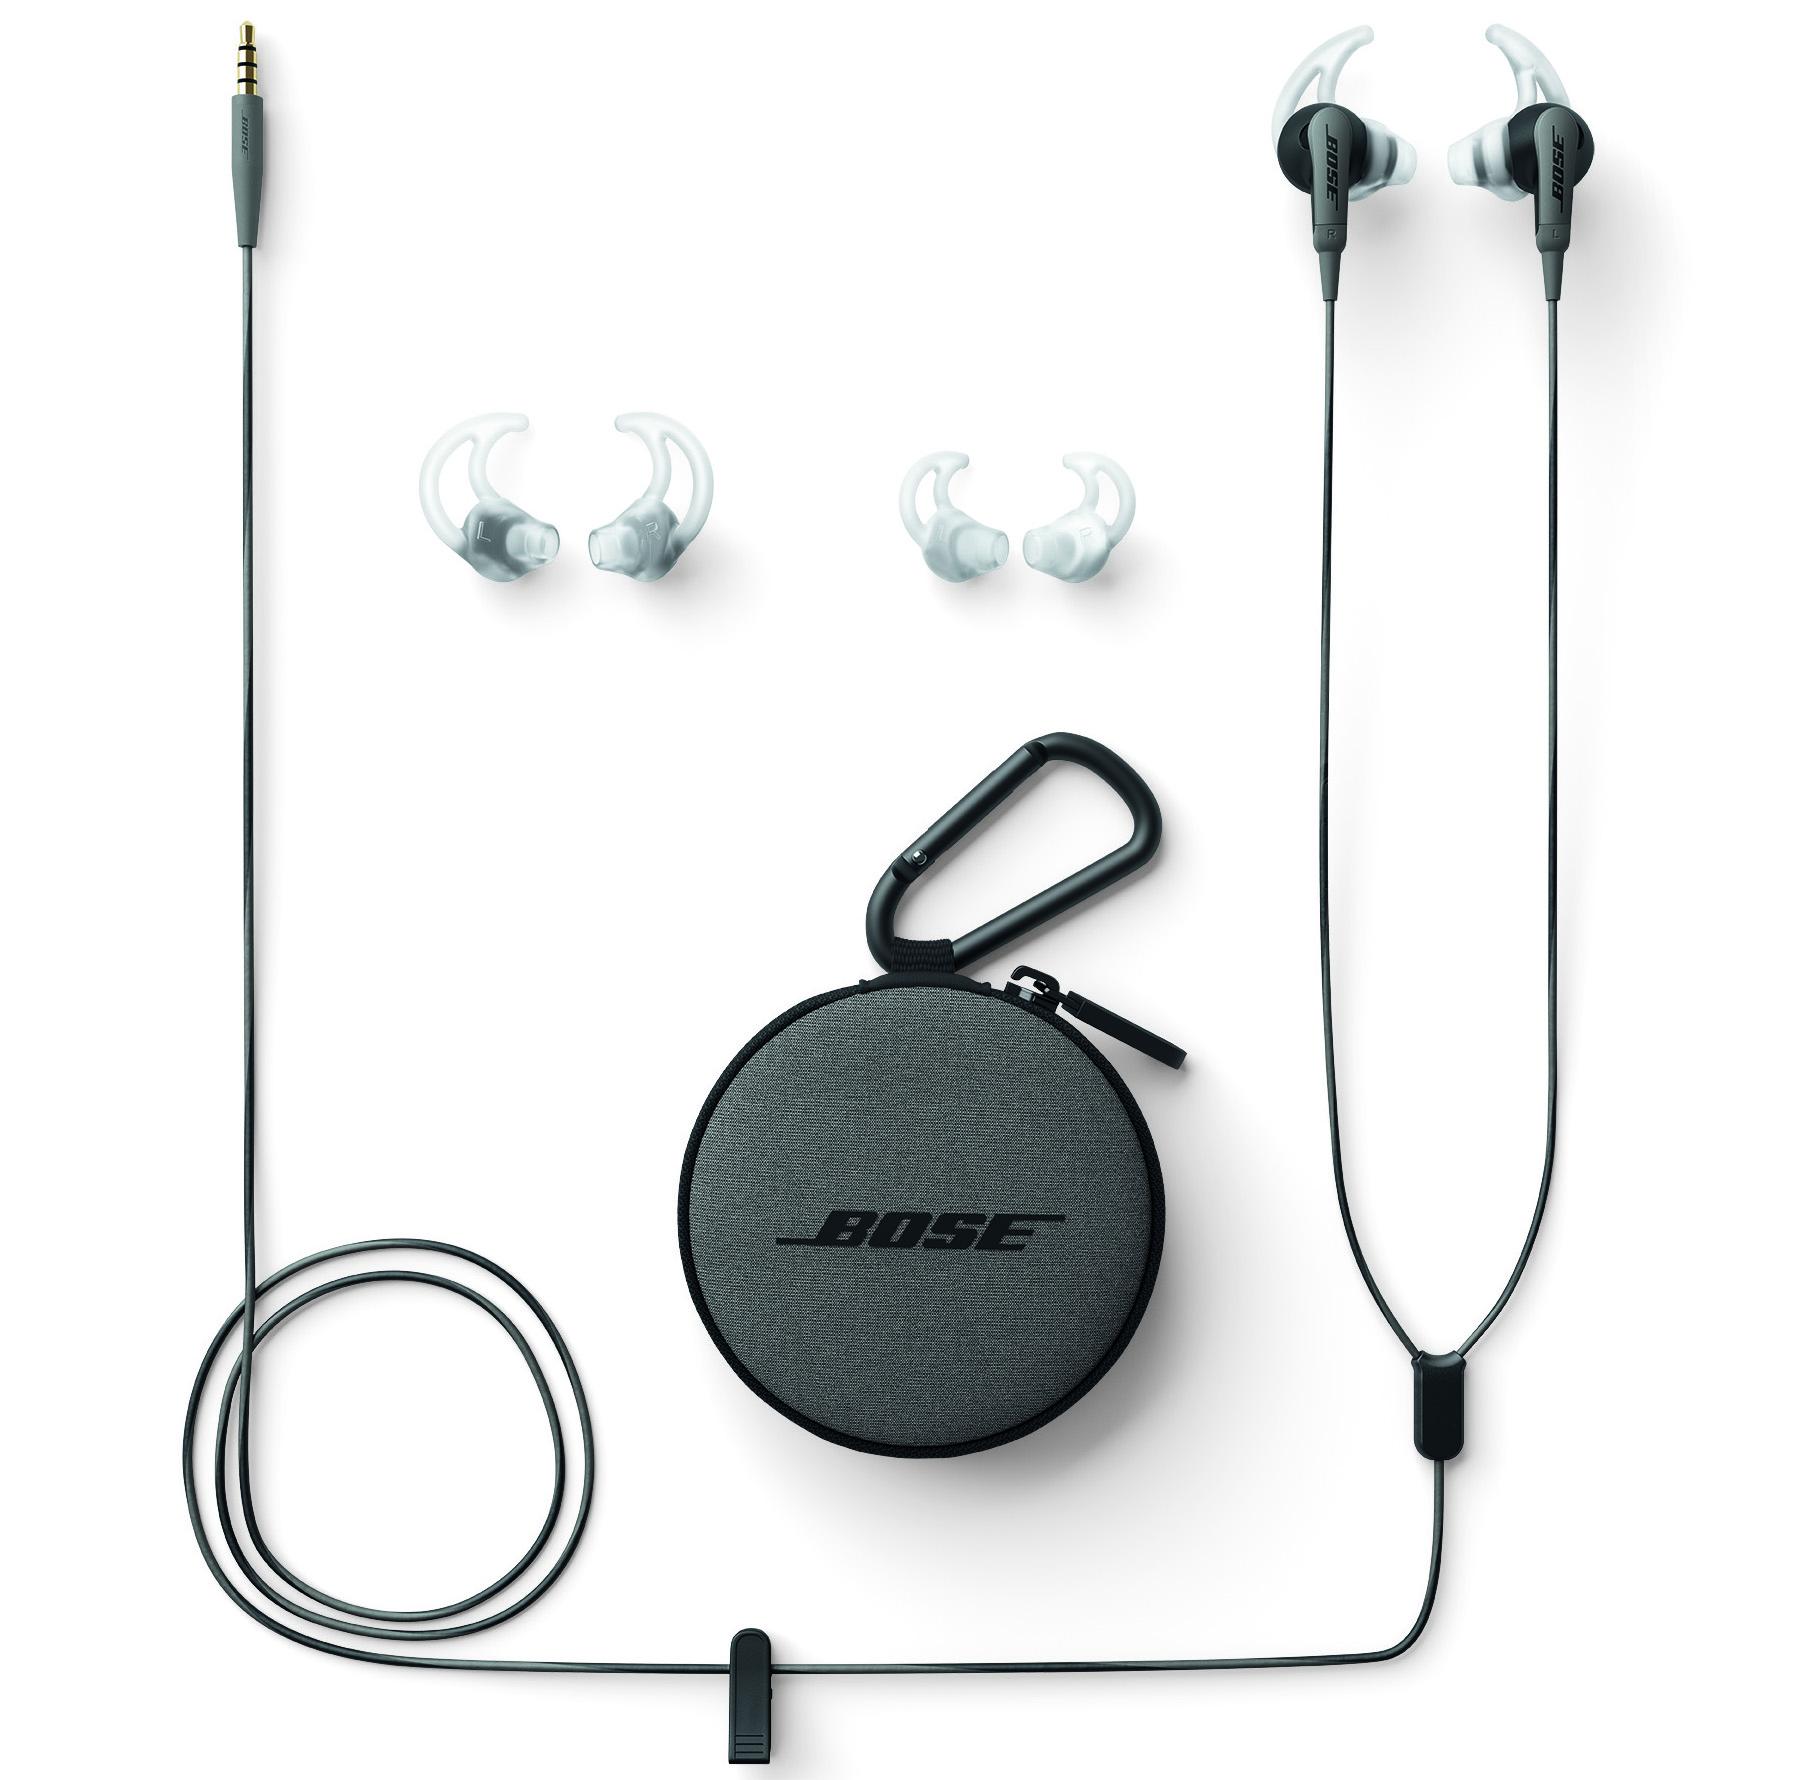 Bose SoundSport Apple Charcoal Black In-Ear Headphones - 741776-0010